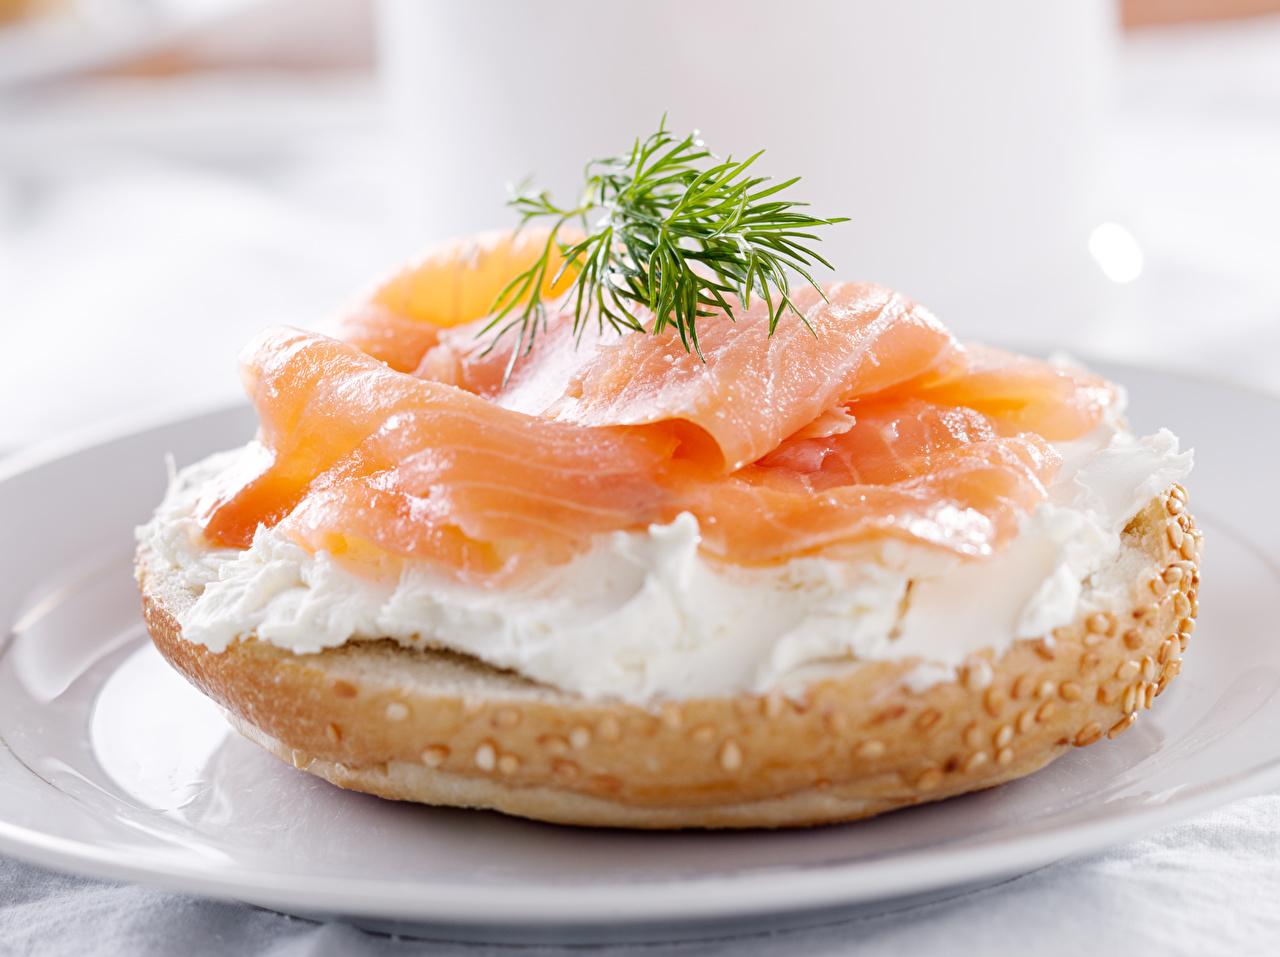 Фото Рыба Укроп Булочки бутерброд Еда Бутерброды Пища Продукты питания